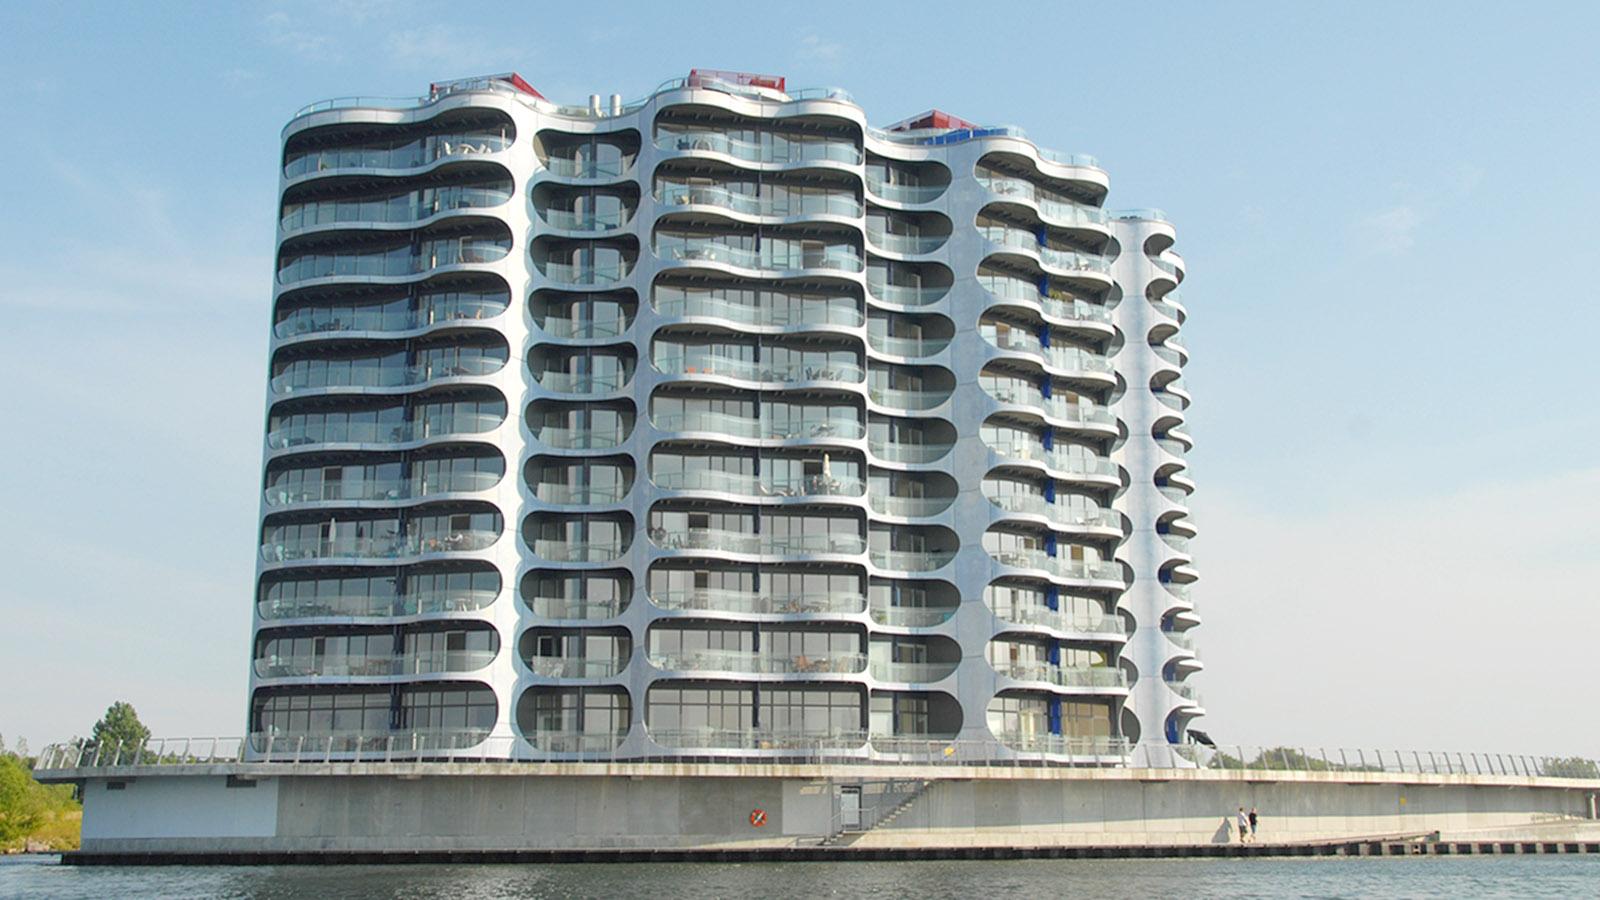 Grünes Kopenhagen: Das Metropolis-Wohngebäude bei Sluseholmen. Foto: Hilke Maunder